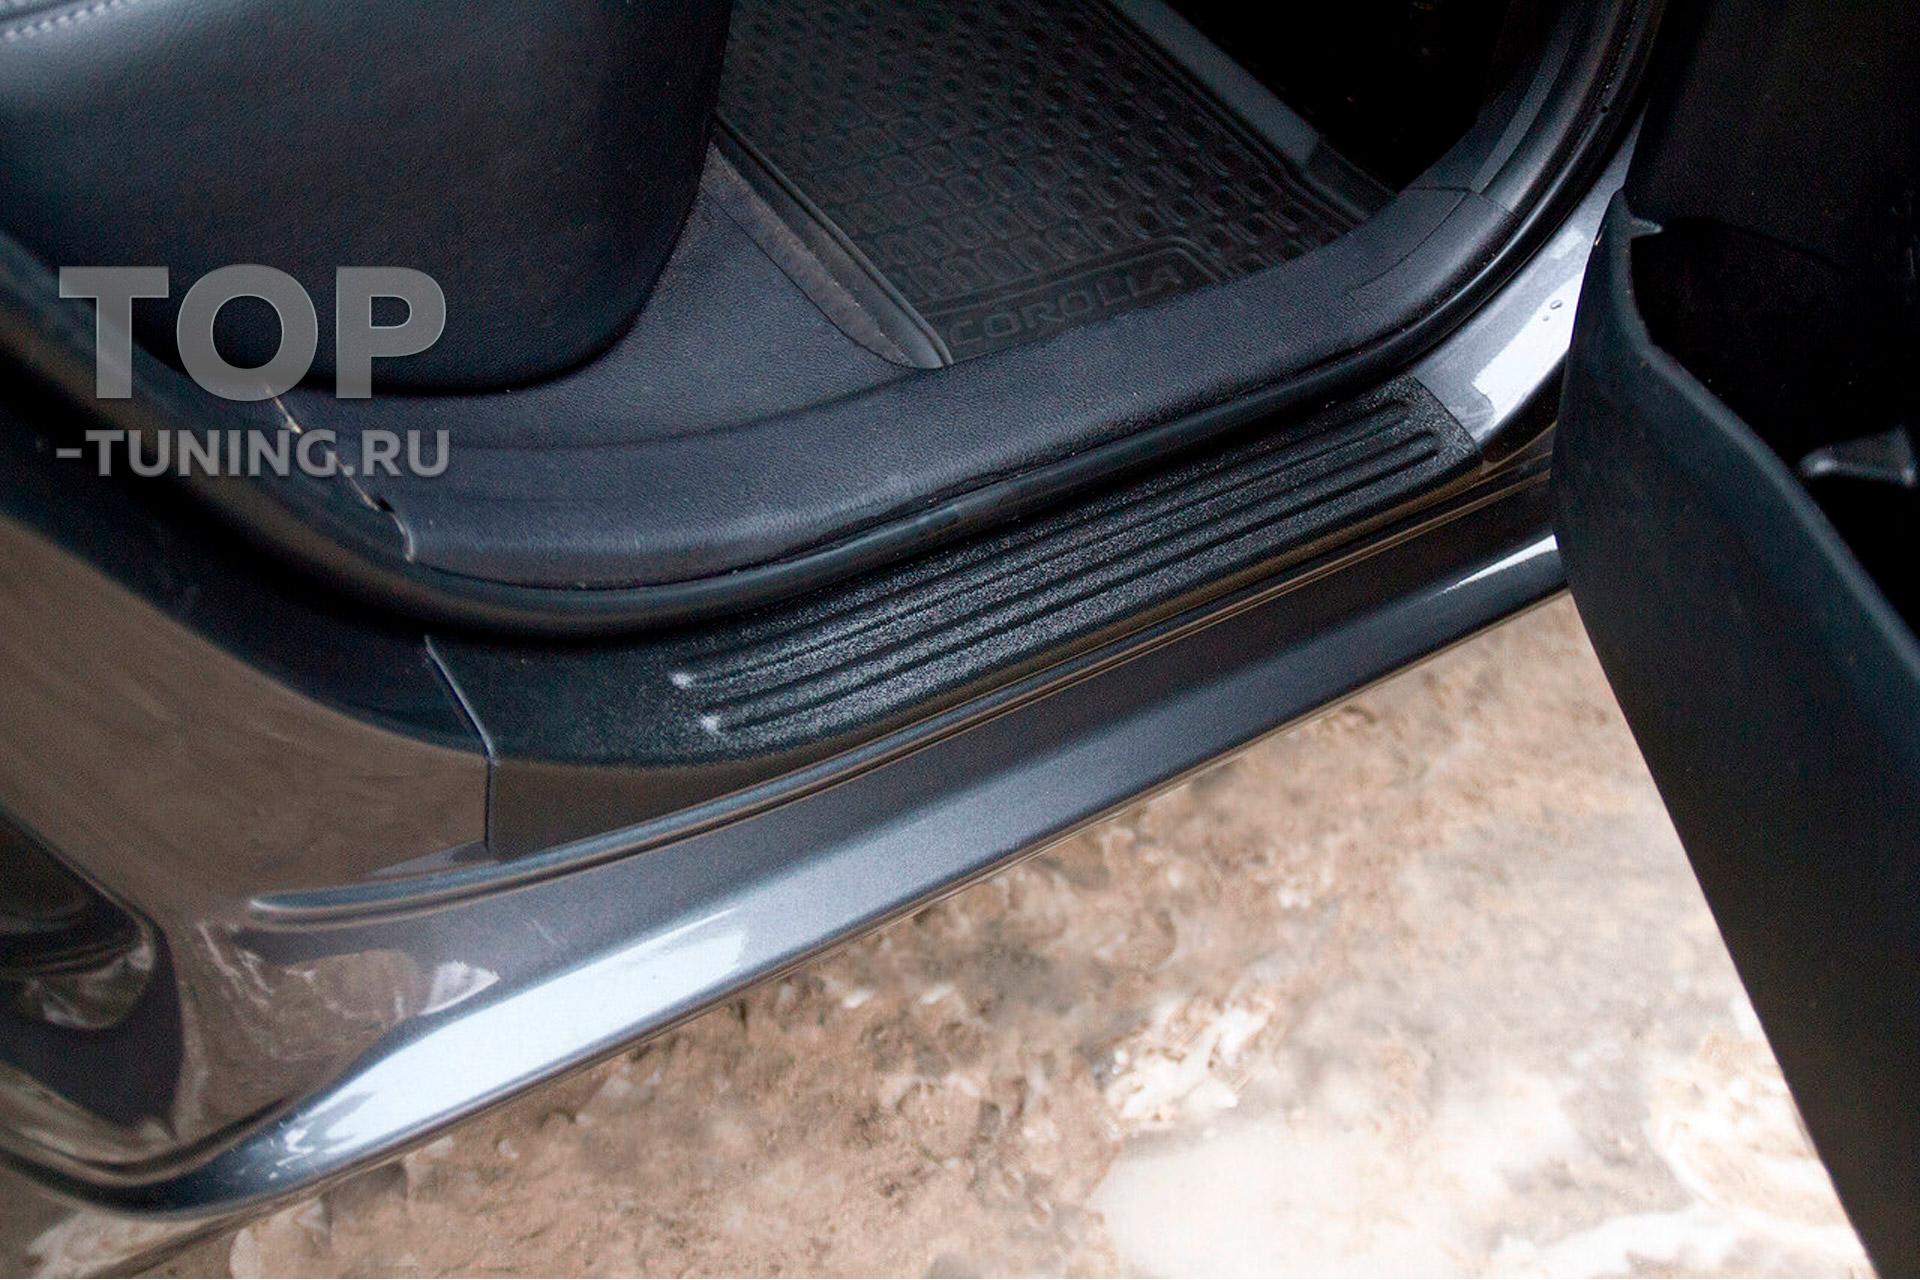 11598 Накладки Bastion на внутренние пороги для Toyota Corolla E160